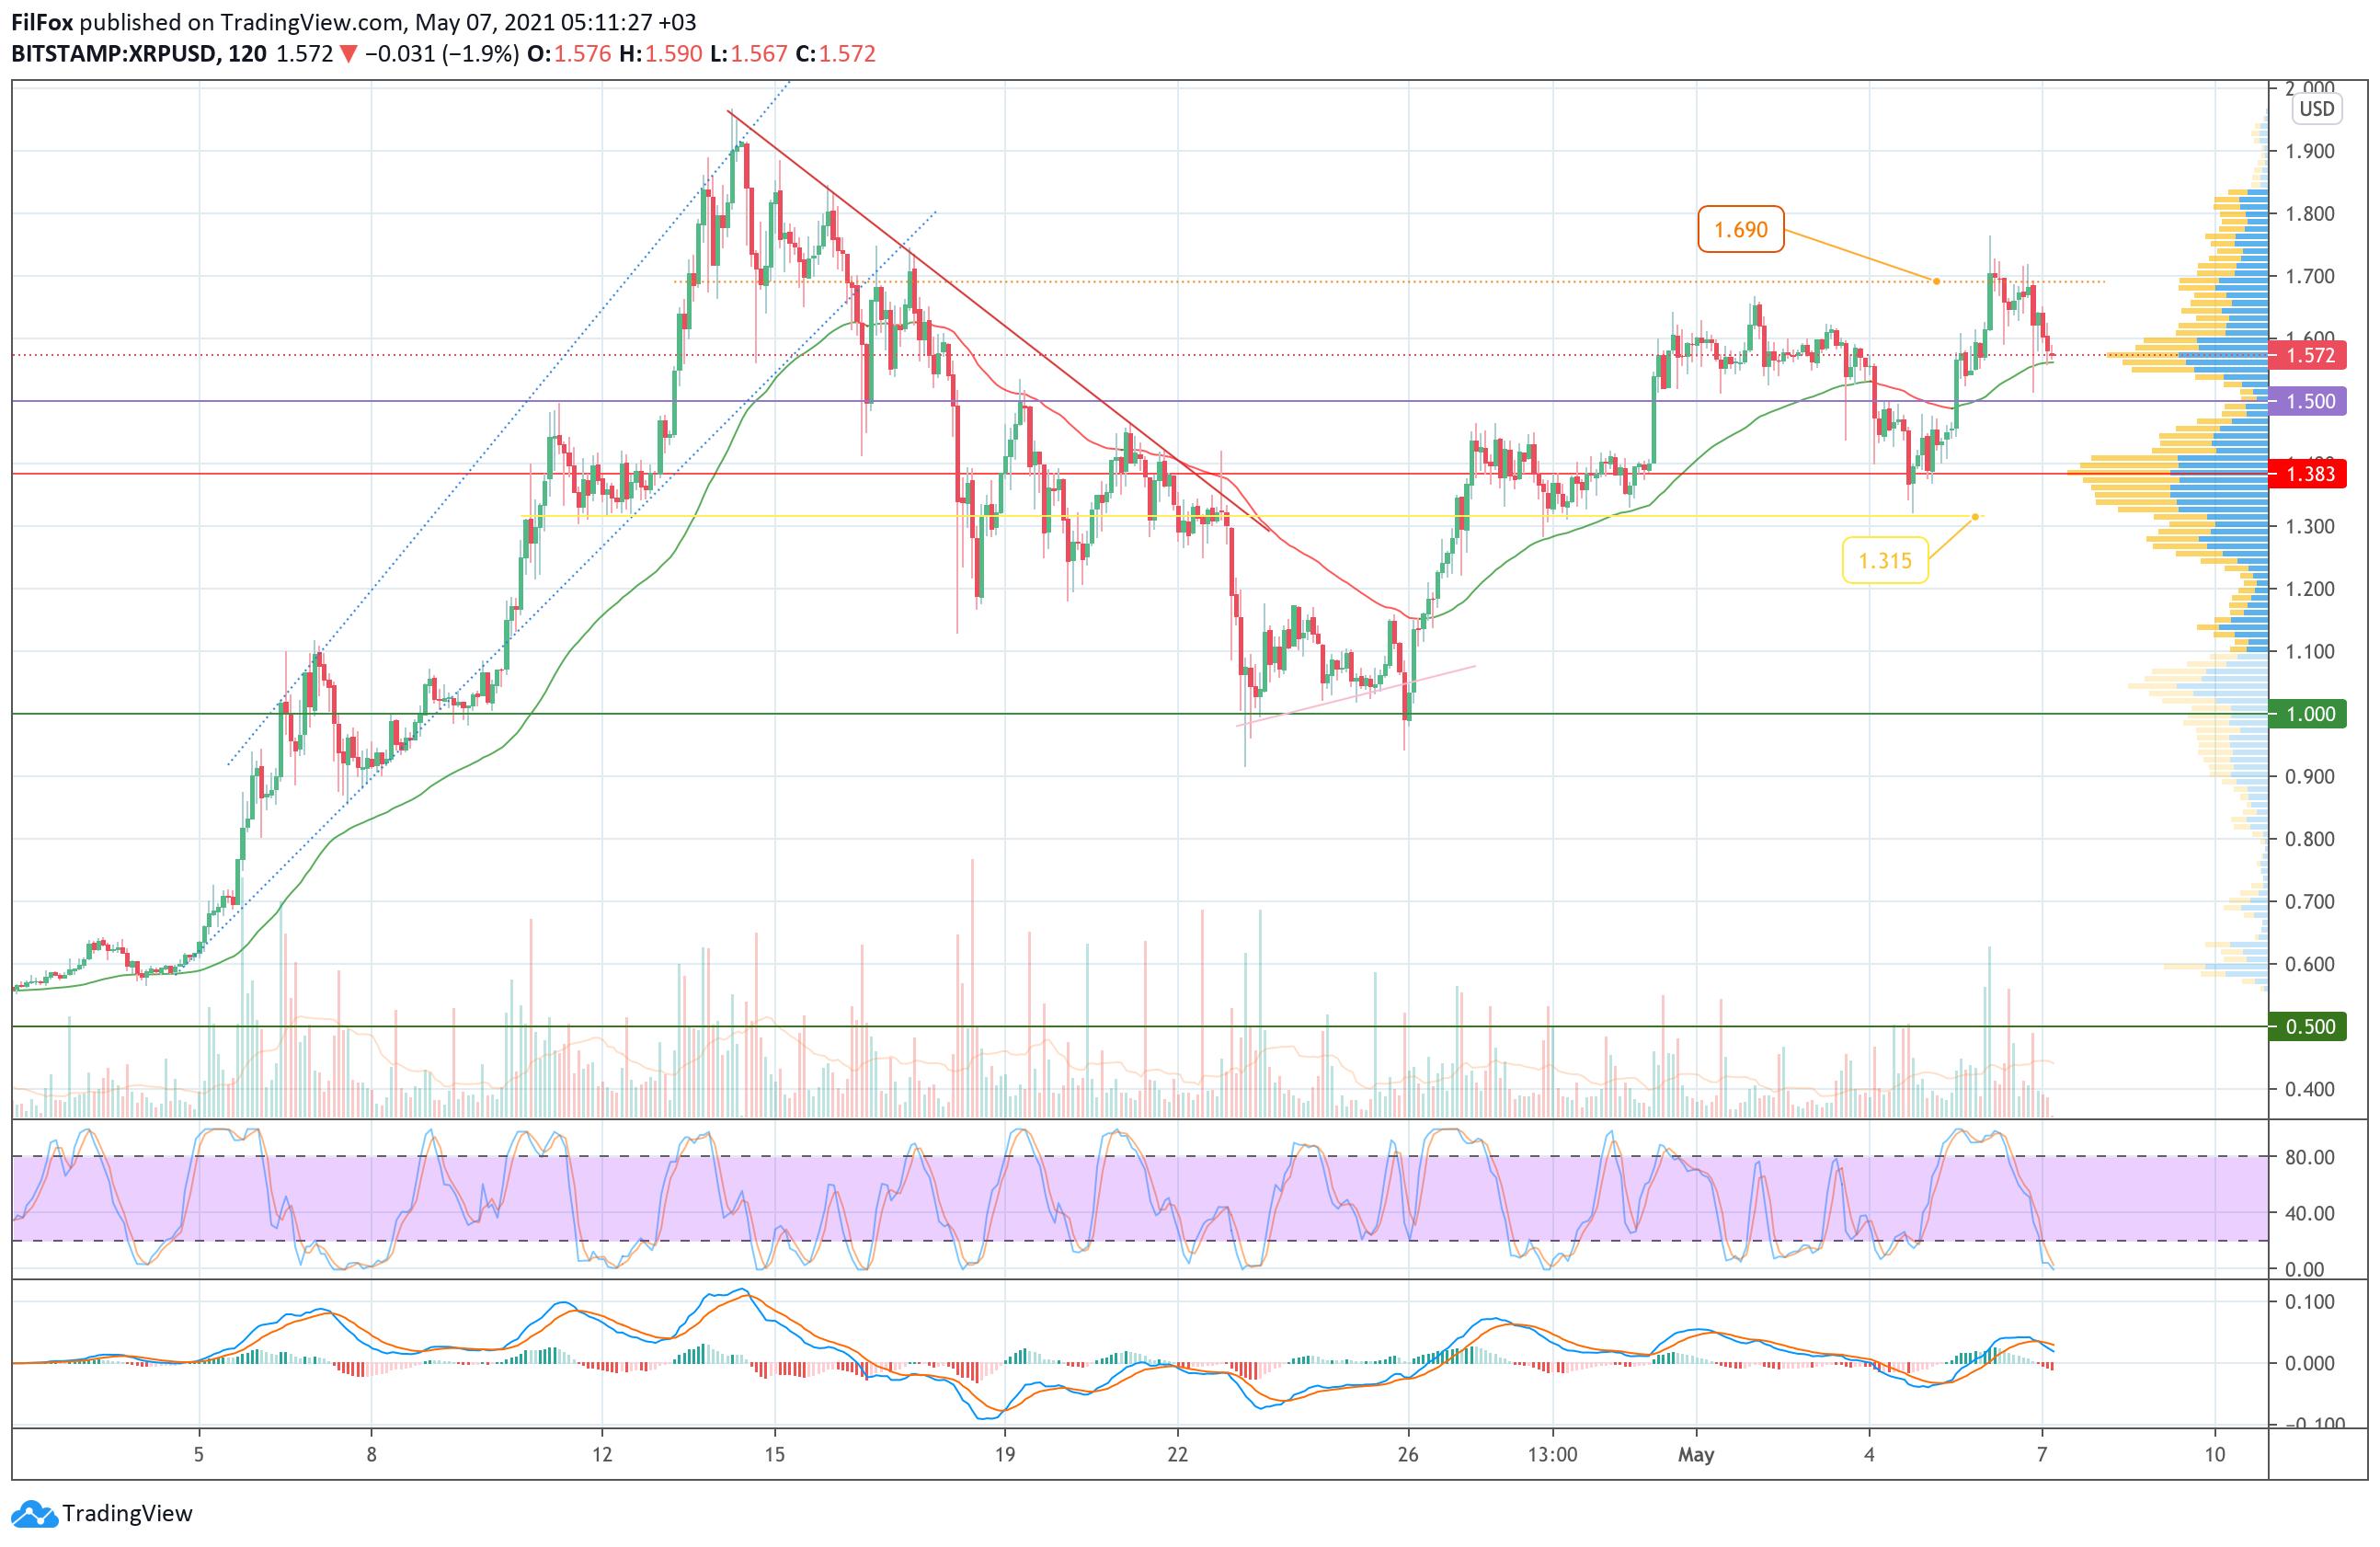 Анализ цен Bitcoin, Ethereum, XRP на 07.05.2021